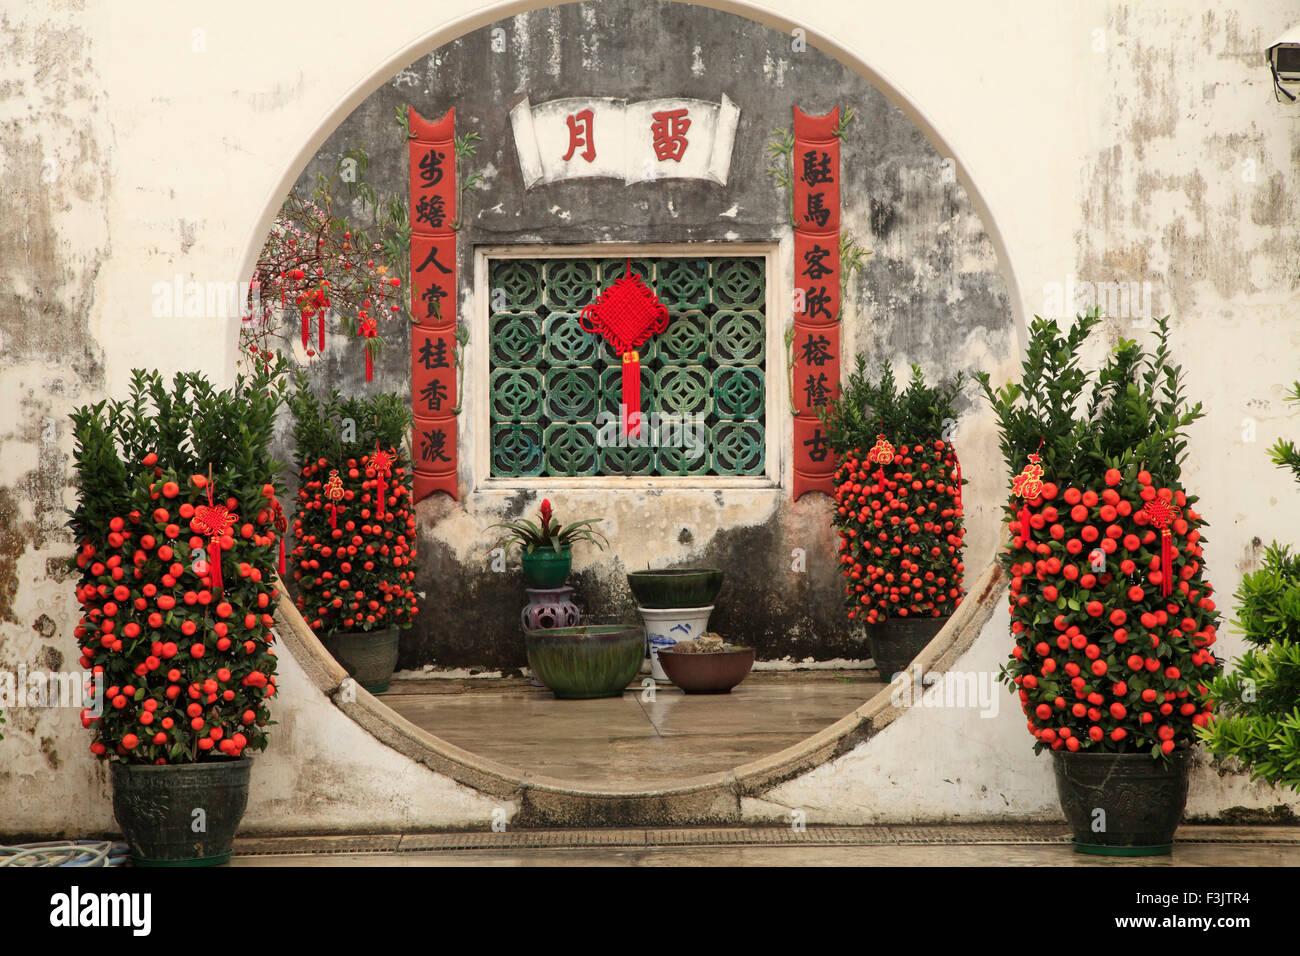 La Chine, Macao, Mandarin's House, Photo Stock